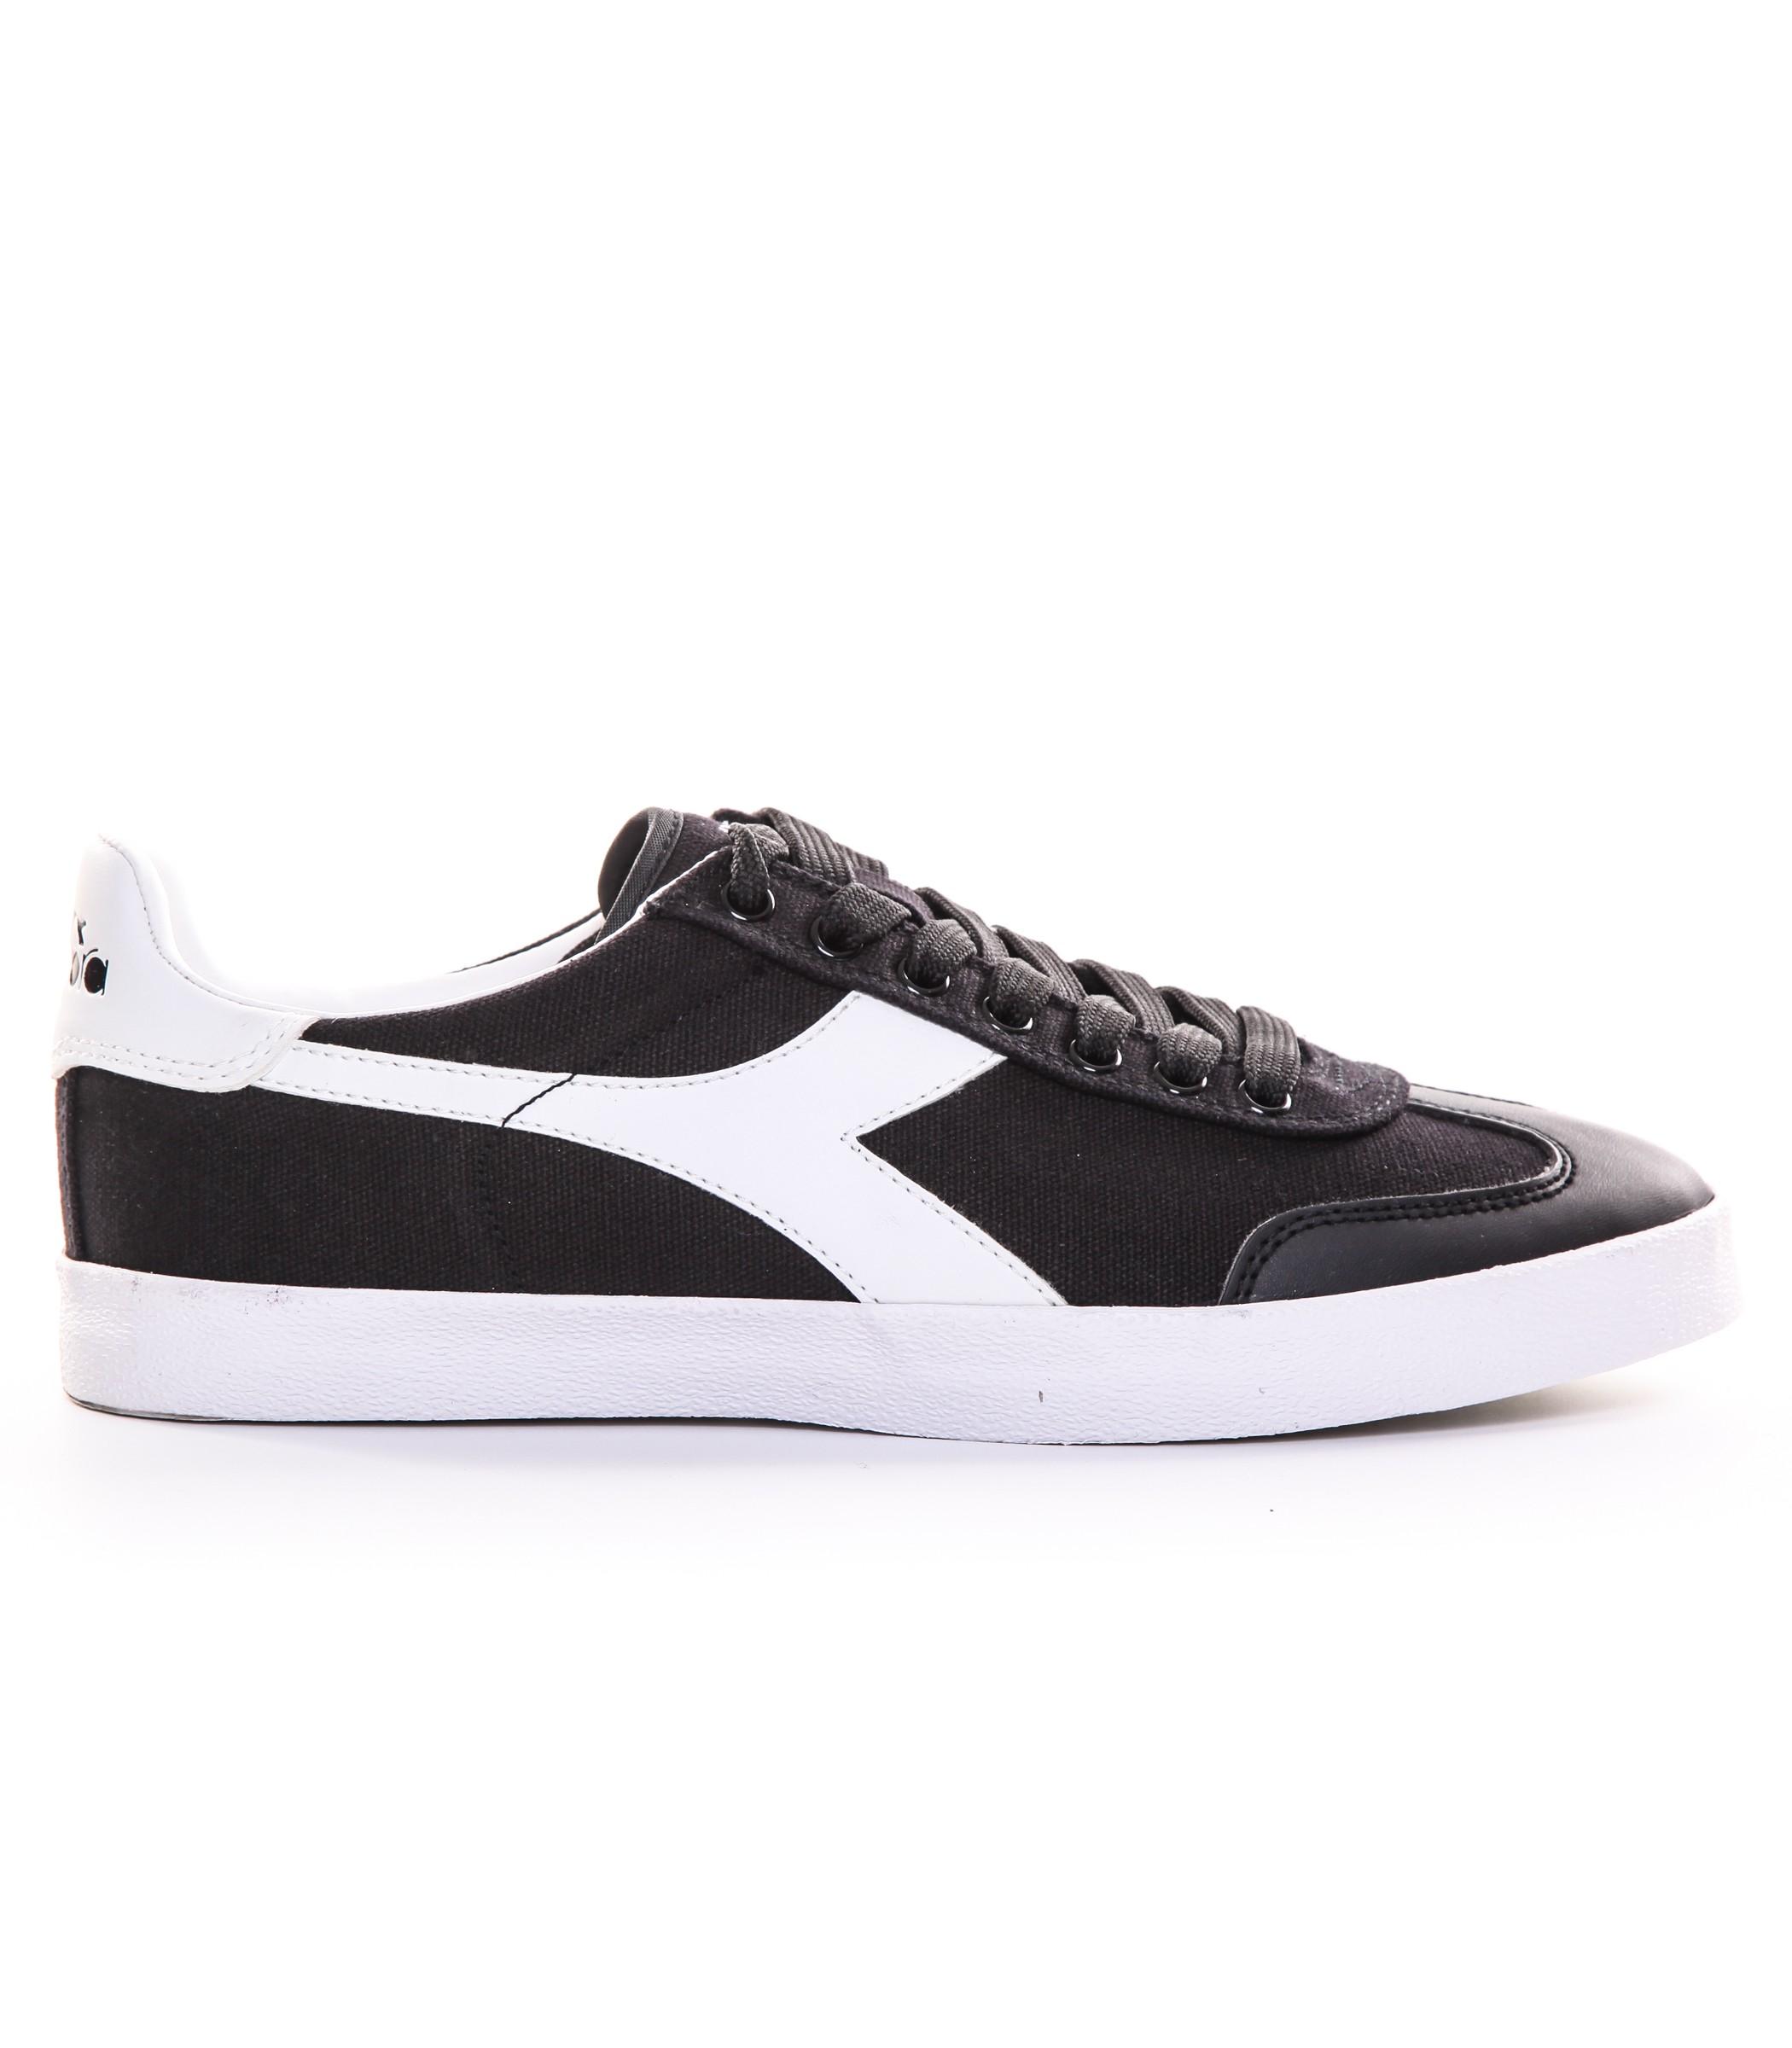 Scarpe Sneakers Diadora PITCH CV da uomo rif. 101.174375 8cbeb61e672